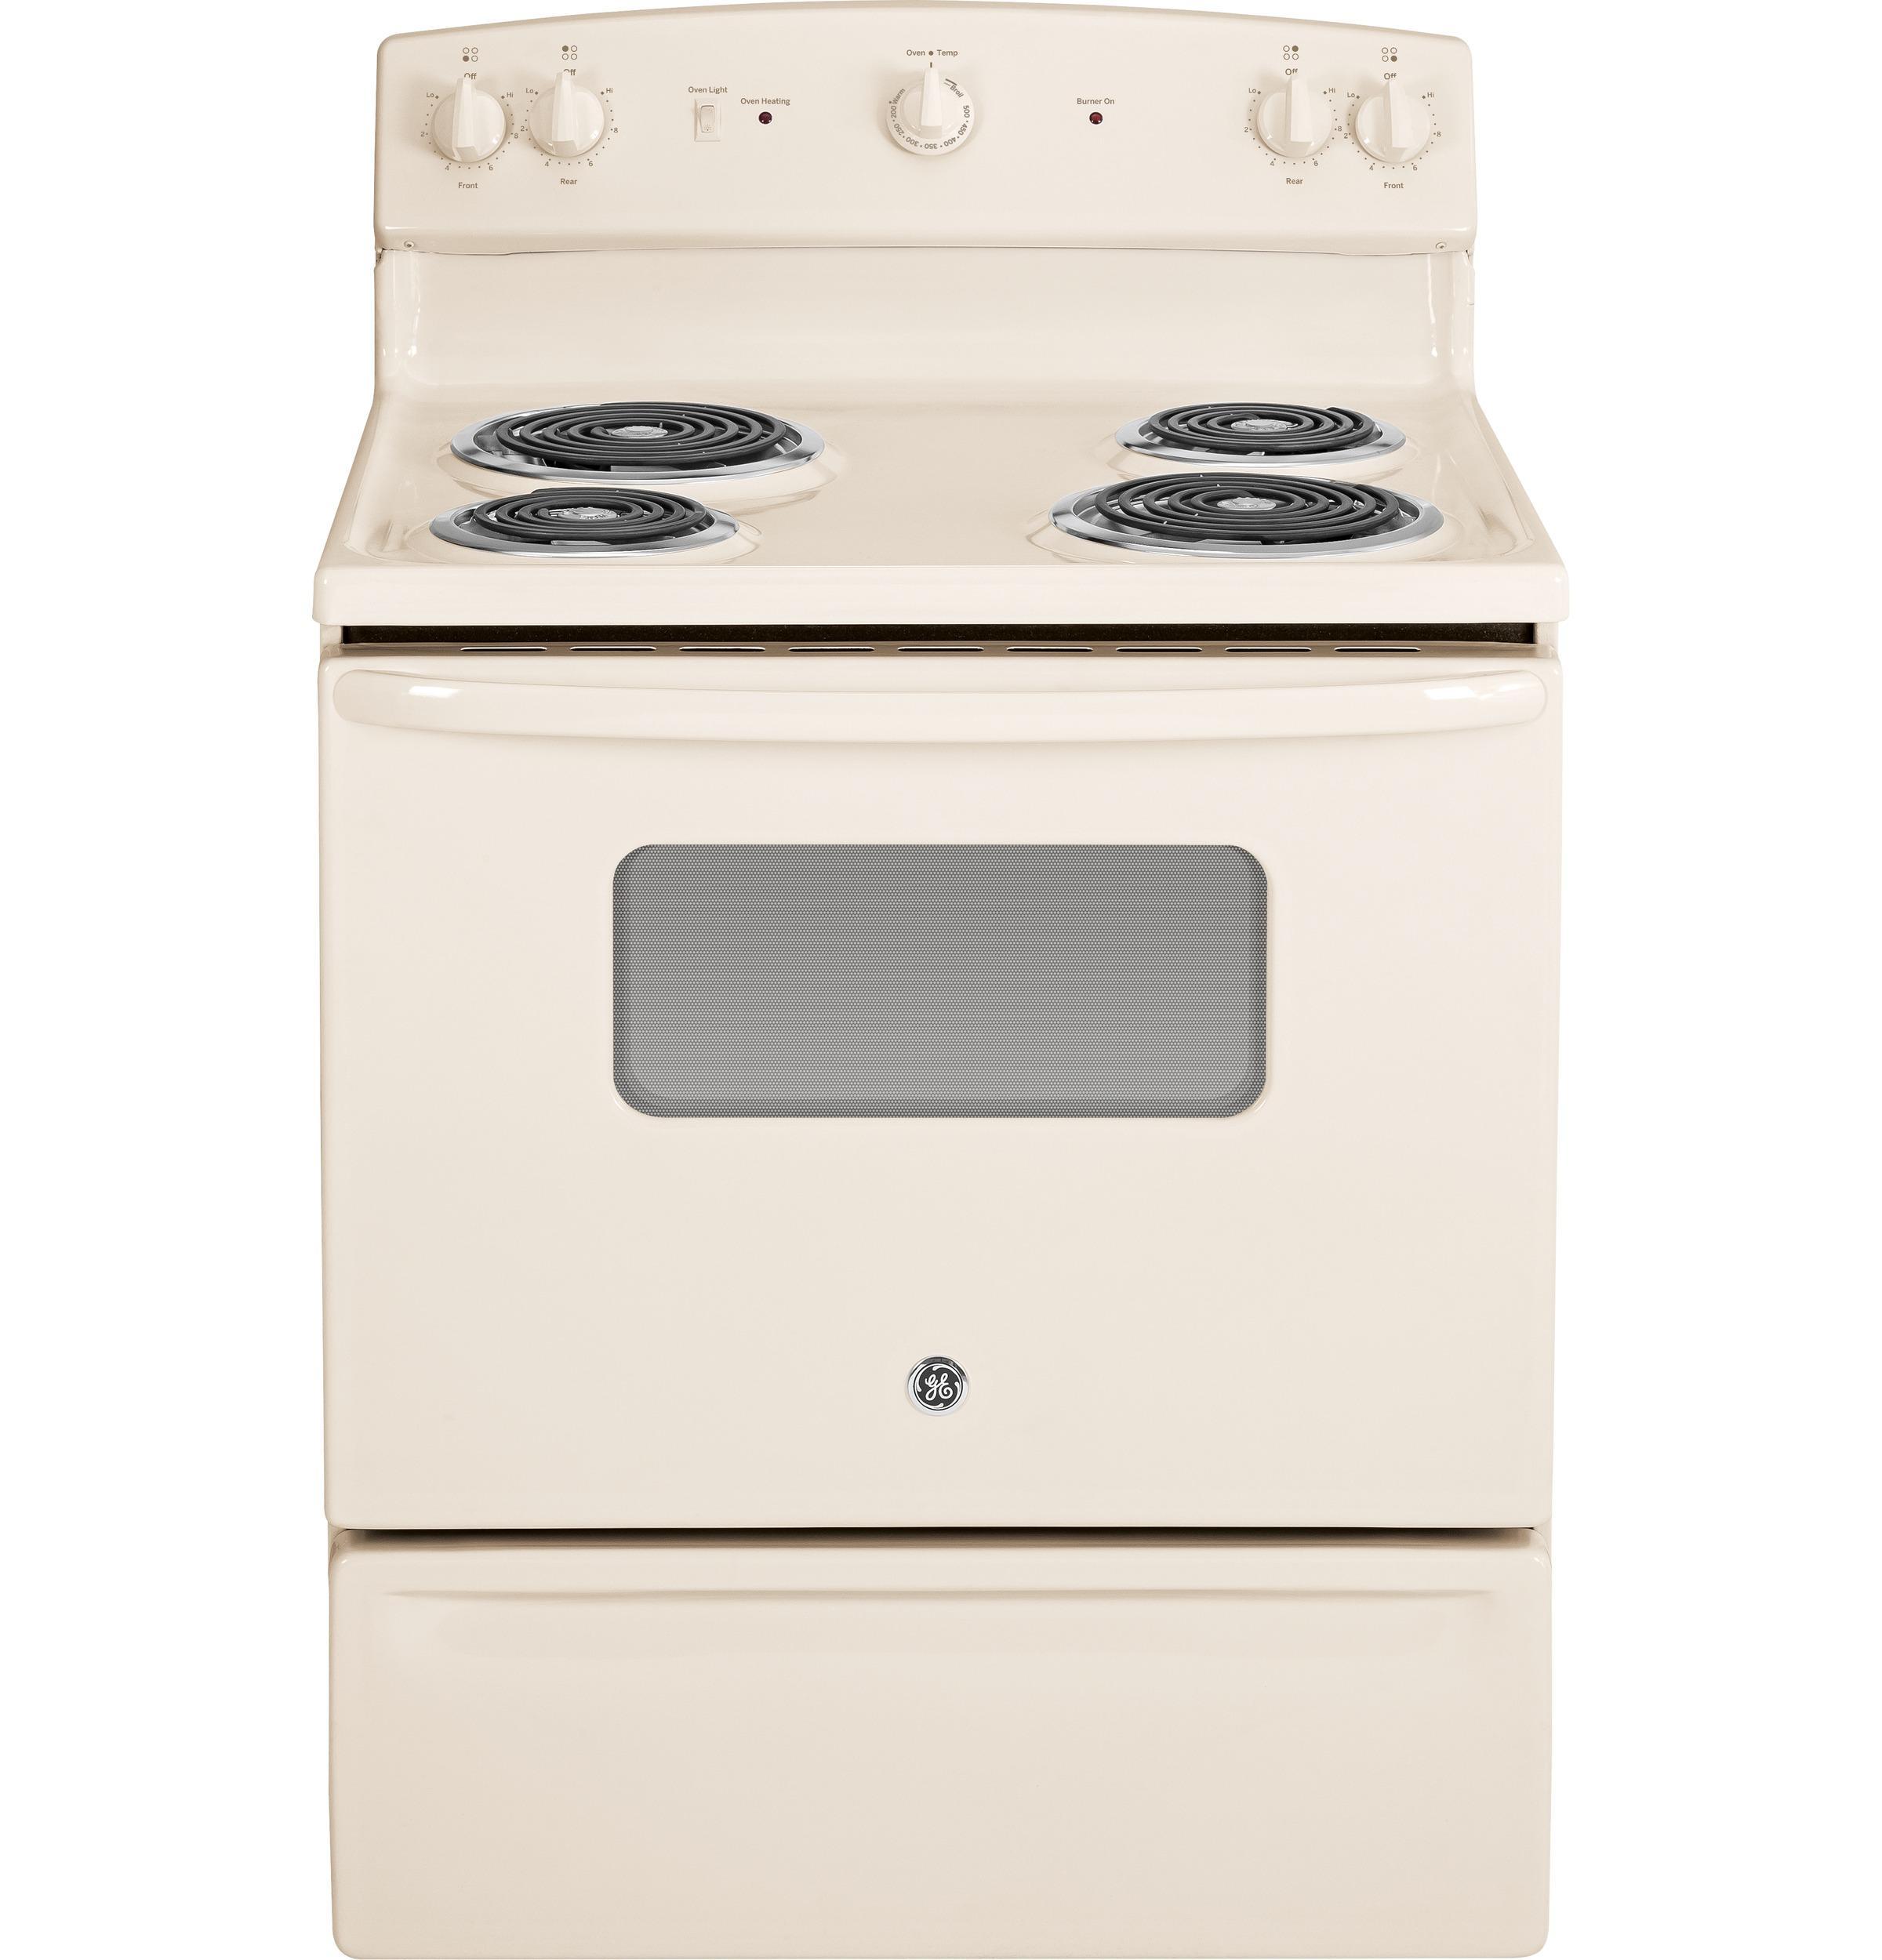 "GE Appliances Electric Range 30"" Free-Standing Electric Range - Item Number: JBS10DFCC"